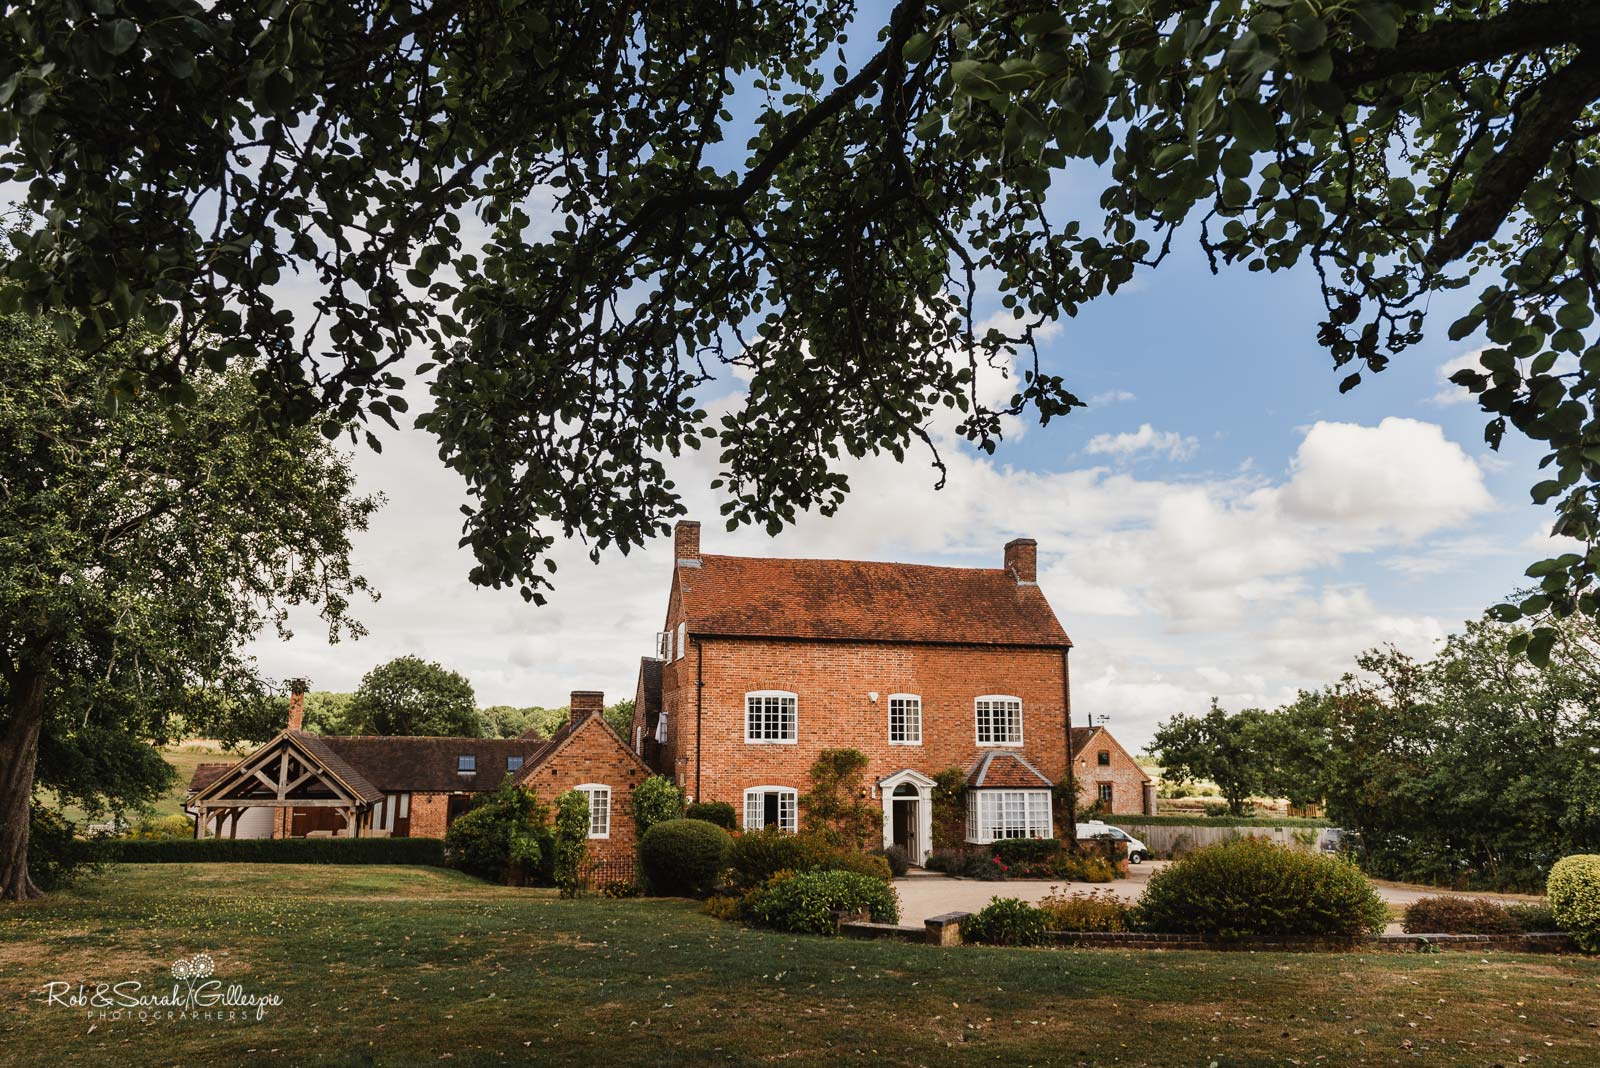 Wedding venue in Warwickshire Wethele Manor